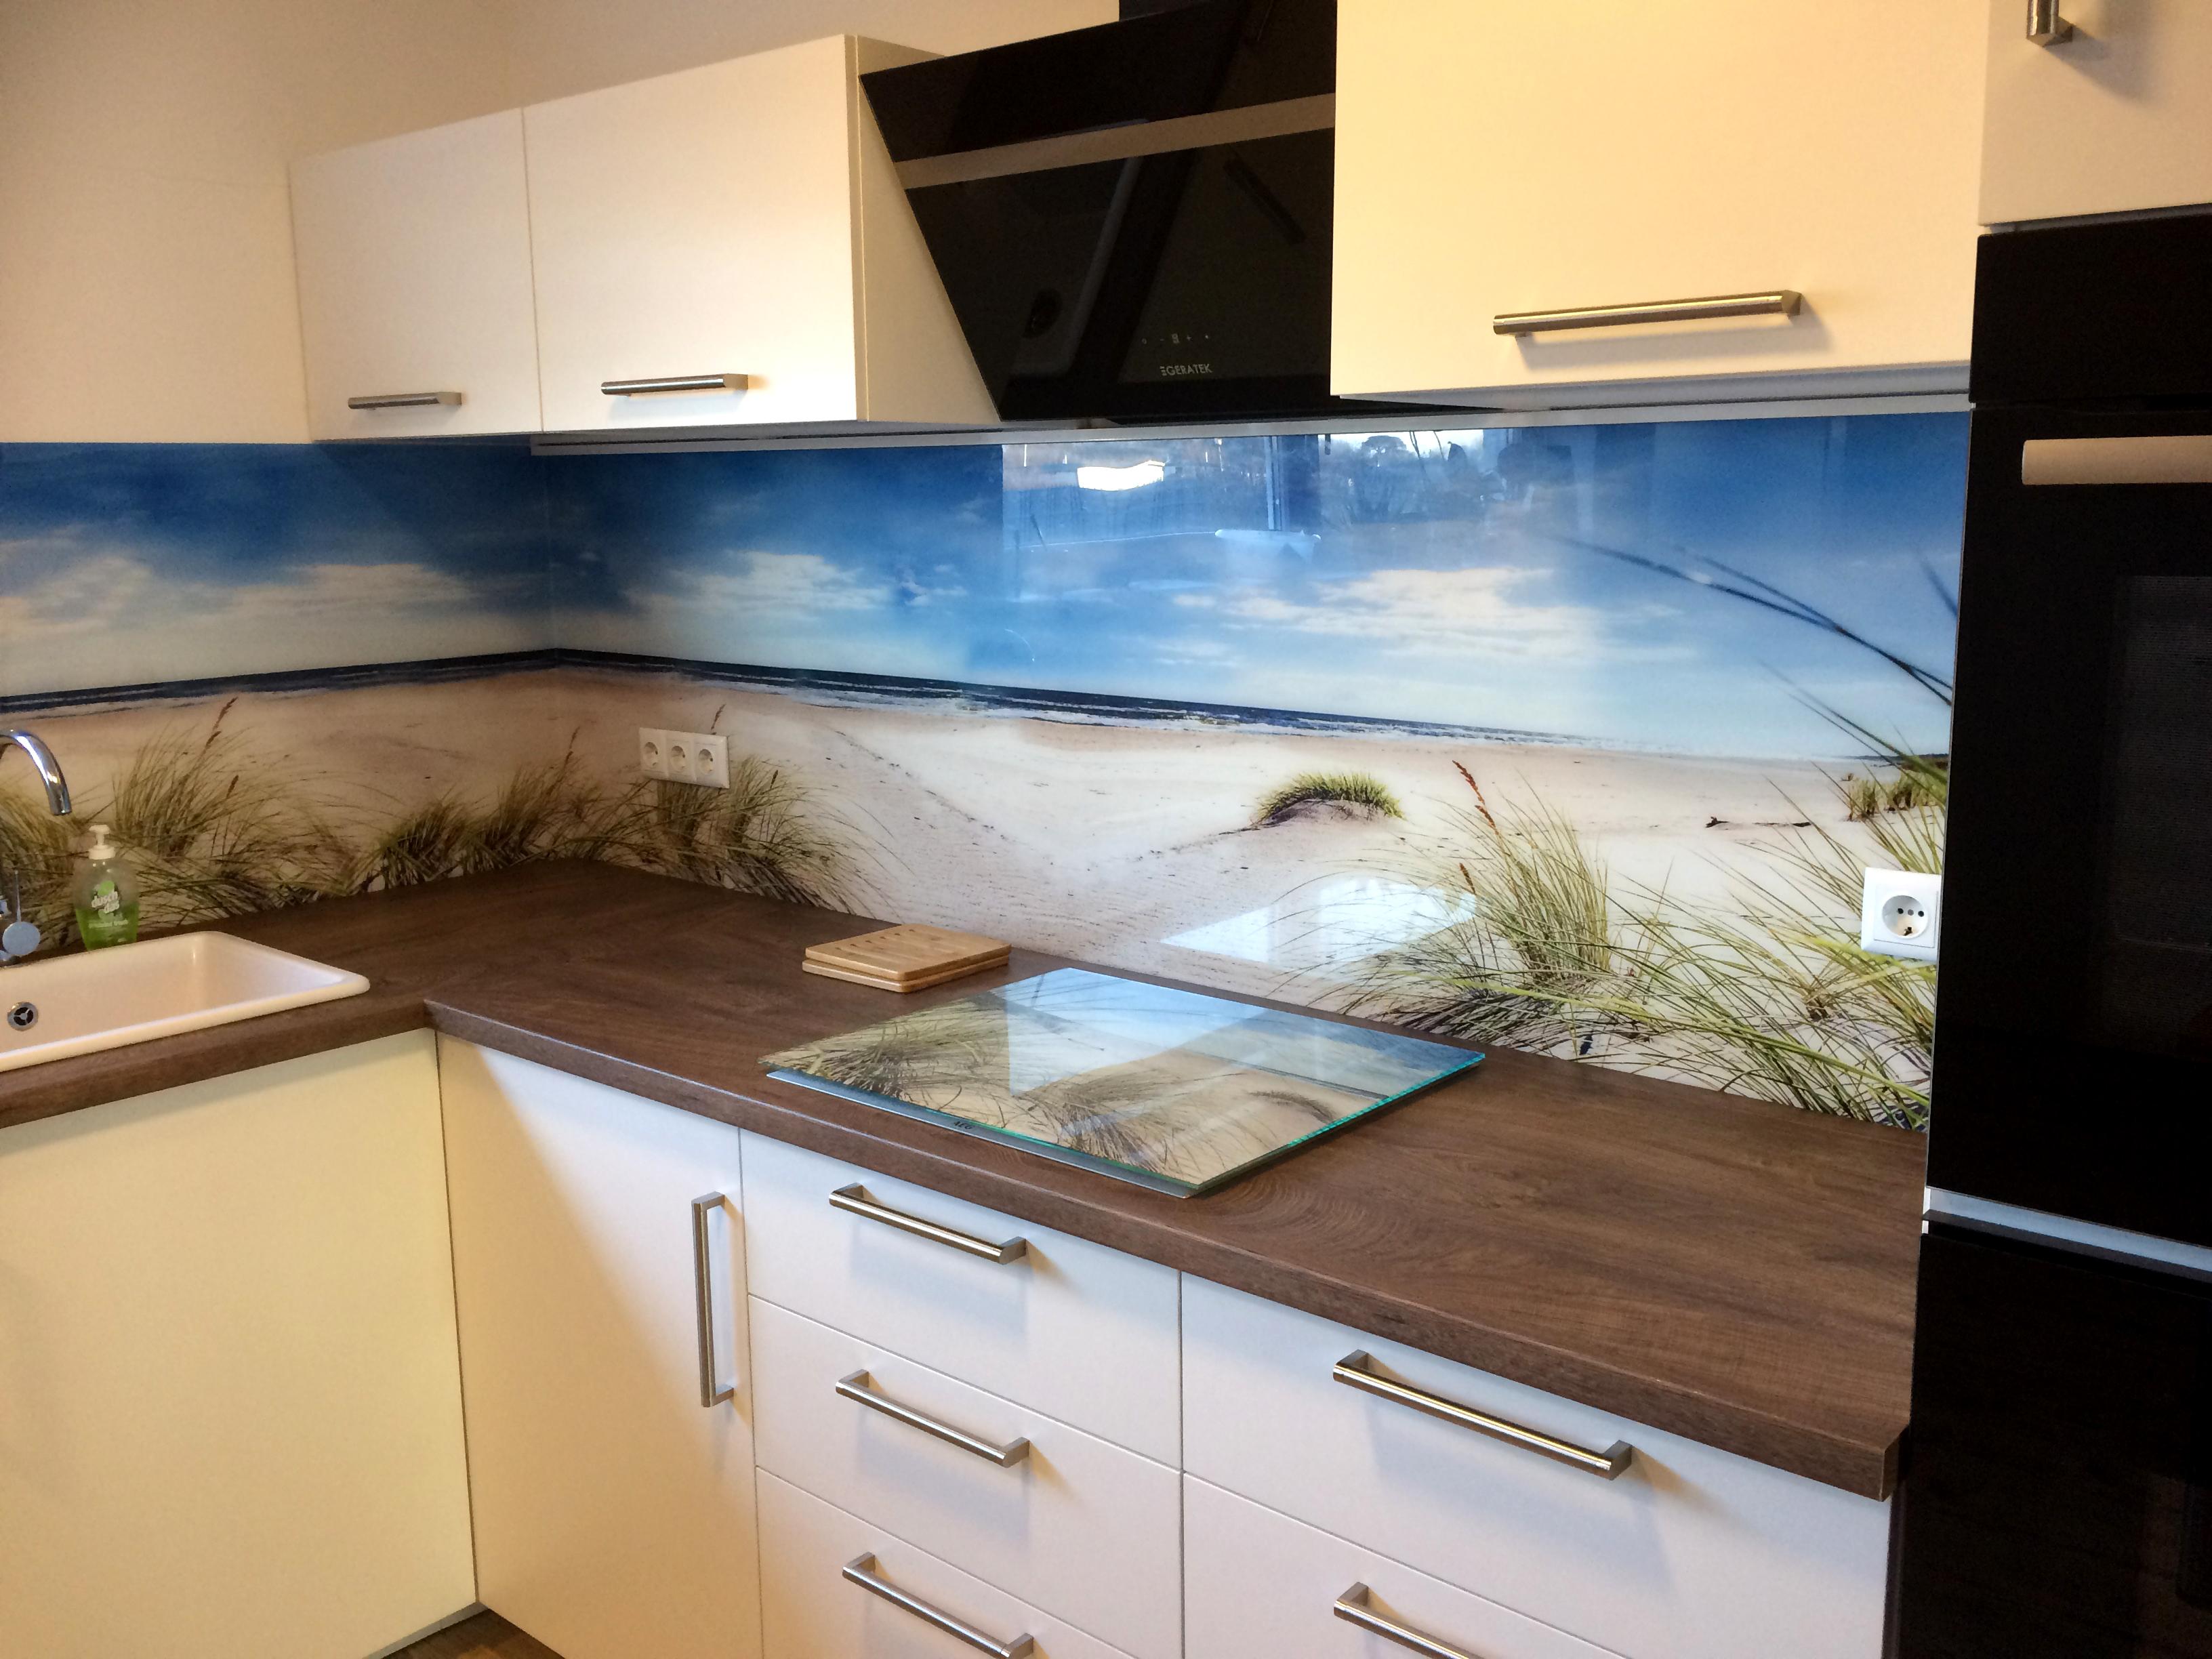 Küchenrückwand nach Maß - Küchenrückwand,spritzschutz